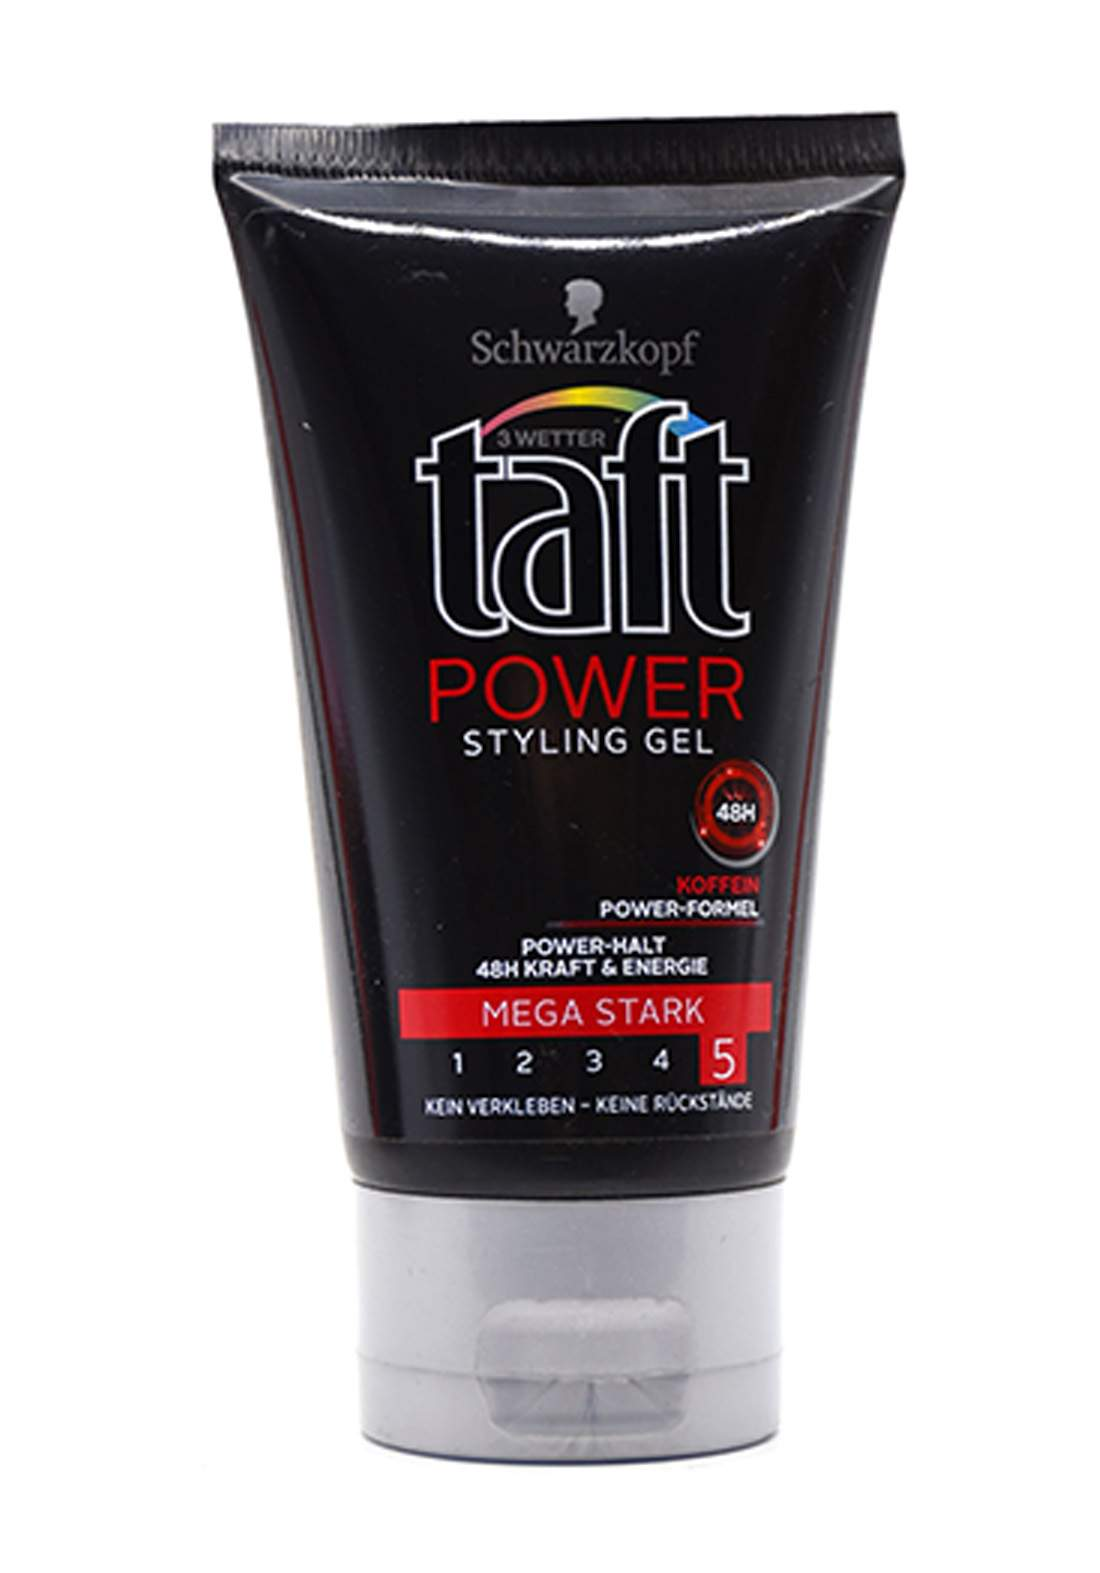 Schwarzkopf taft power styling gel mega strong 5 Hair Gel -150 ml جل تصفيف شعر رجالي